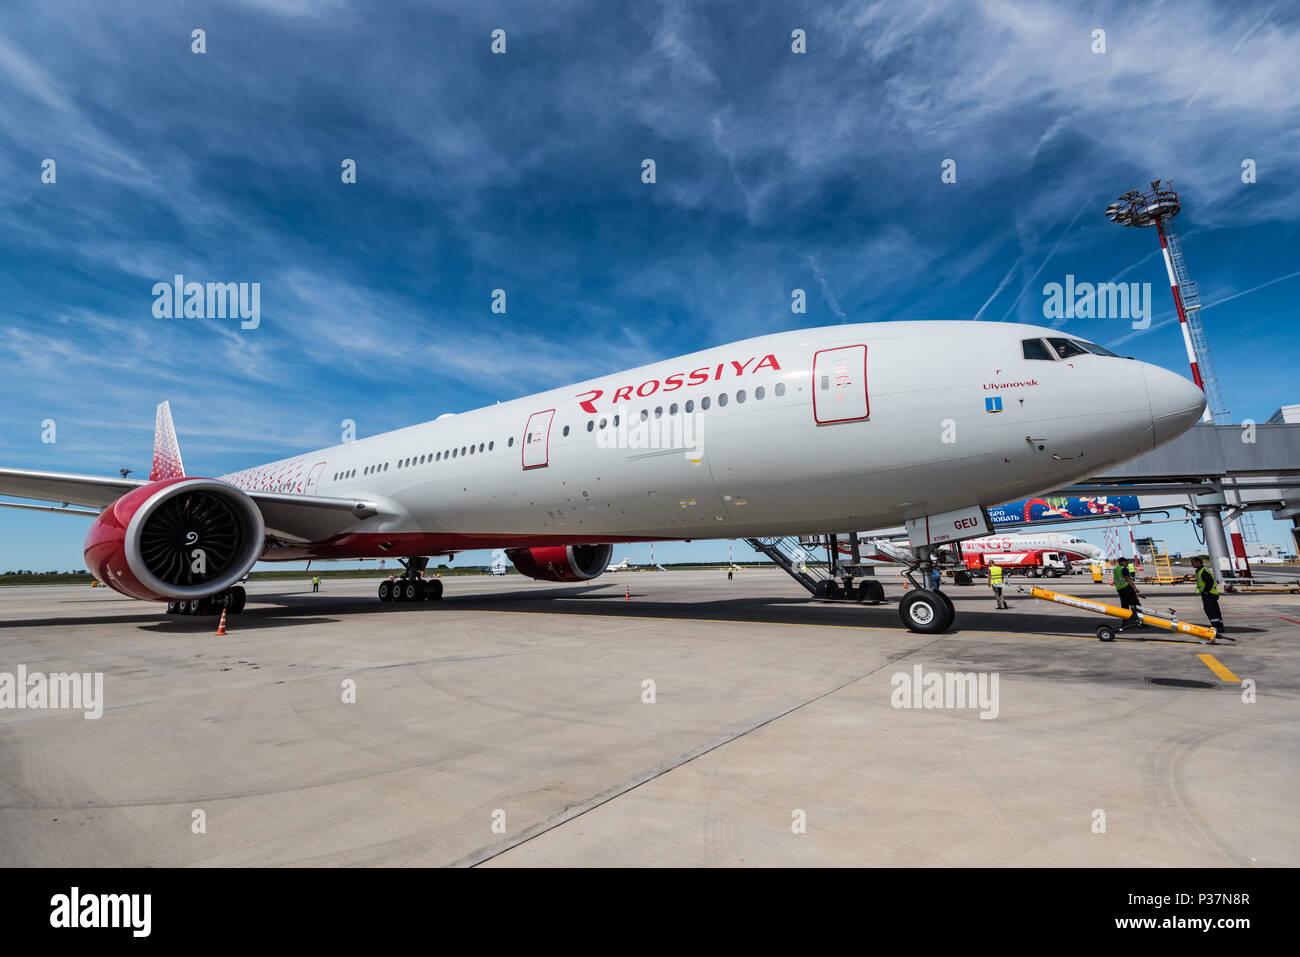 ROSTOV-ON-DON, RUSSIA - 17 JUNE 2018: Boeing 777-300ER of Rossiya airlines in Platov international airport. - Stock Image